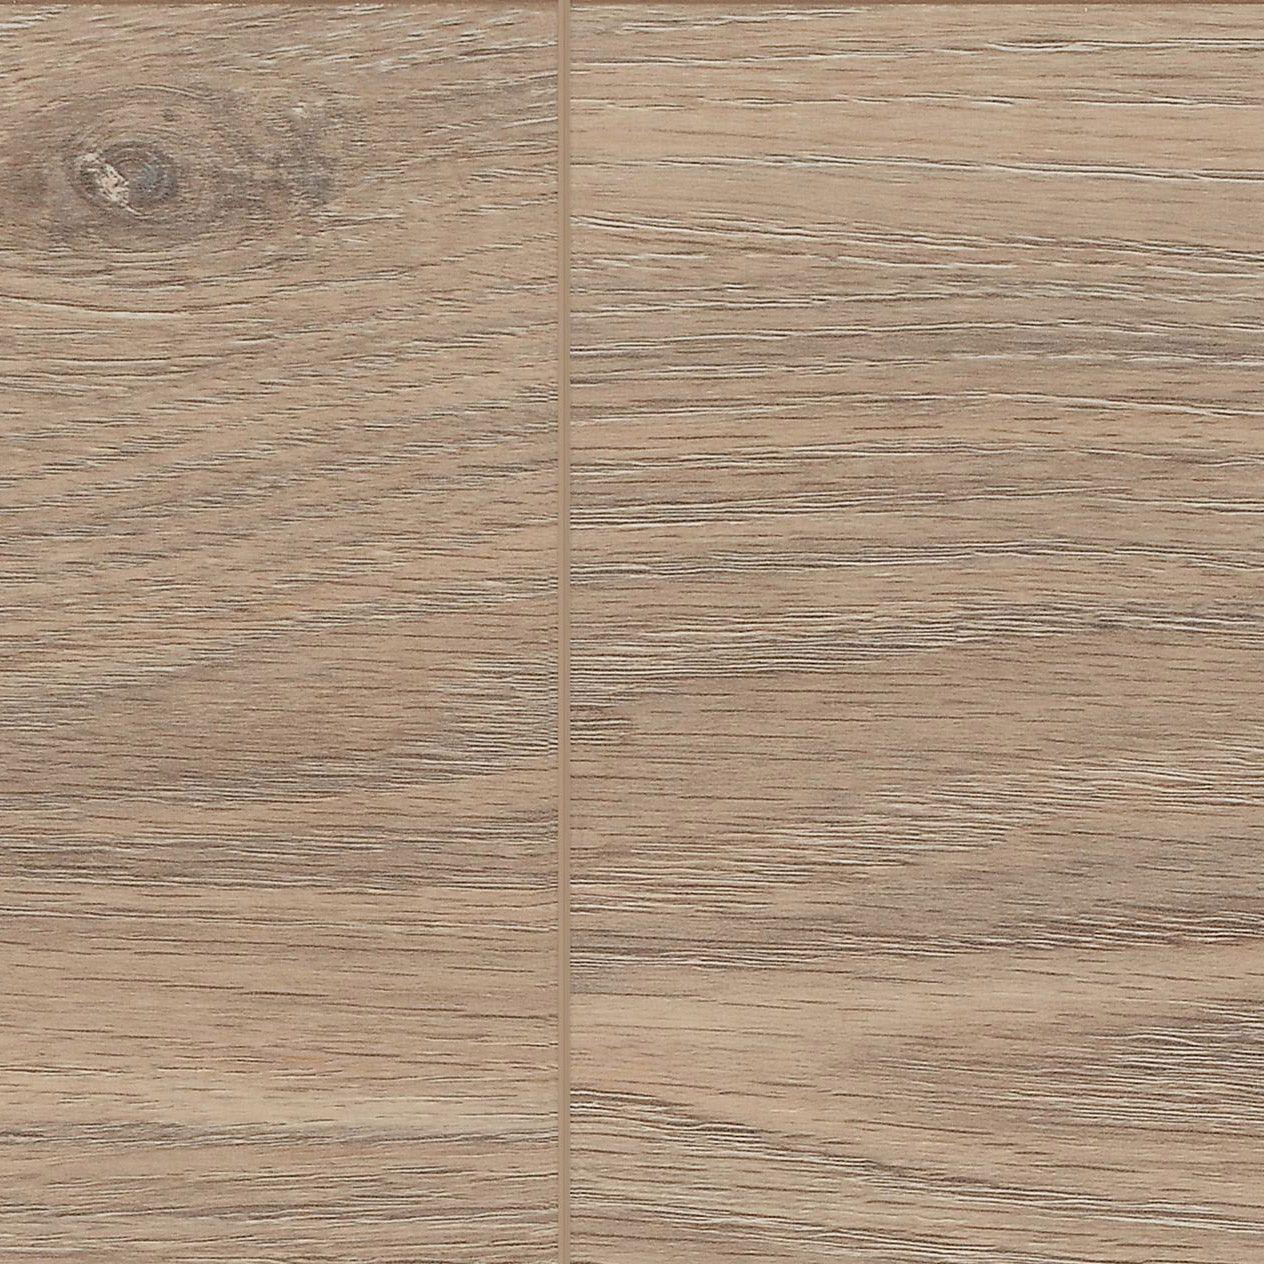 Arpeggio Natural Heritage Oak Effect Laminate Flooring 1 85 M² Sample Departments Diy At B Q